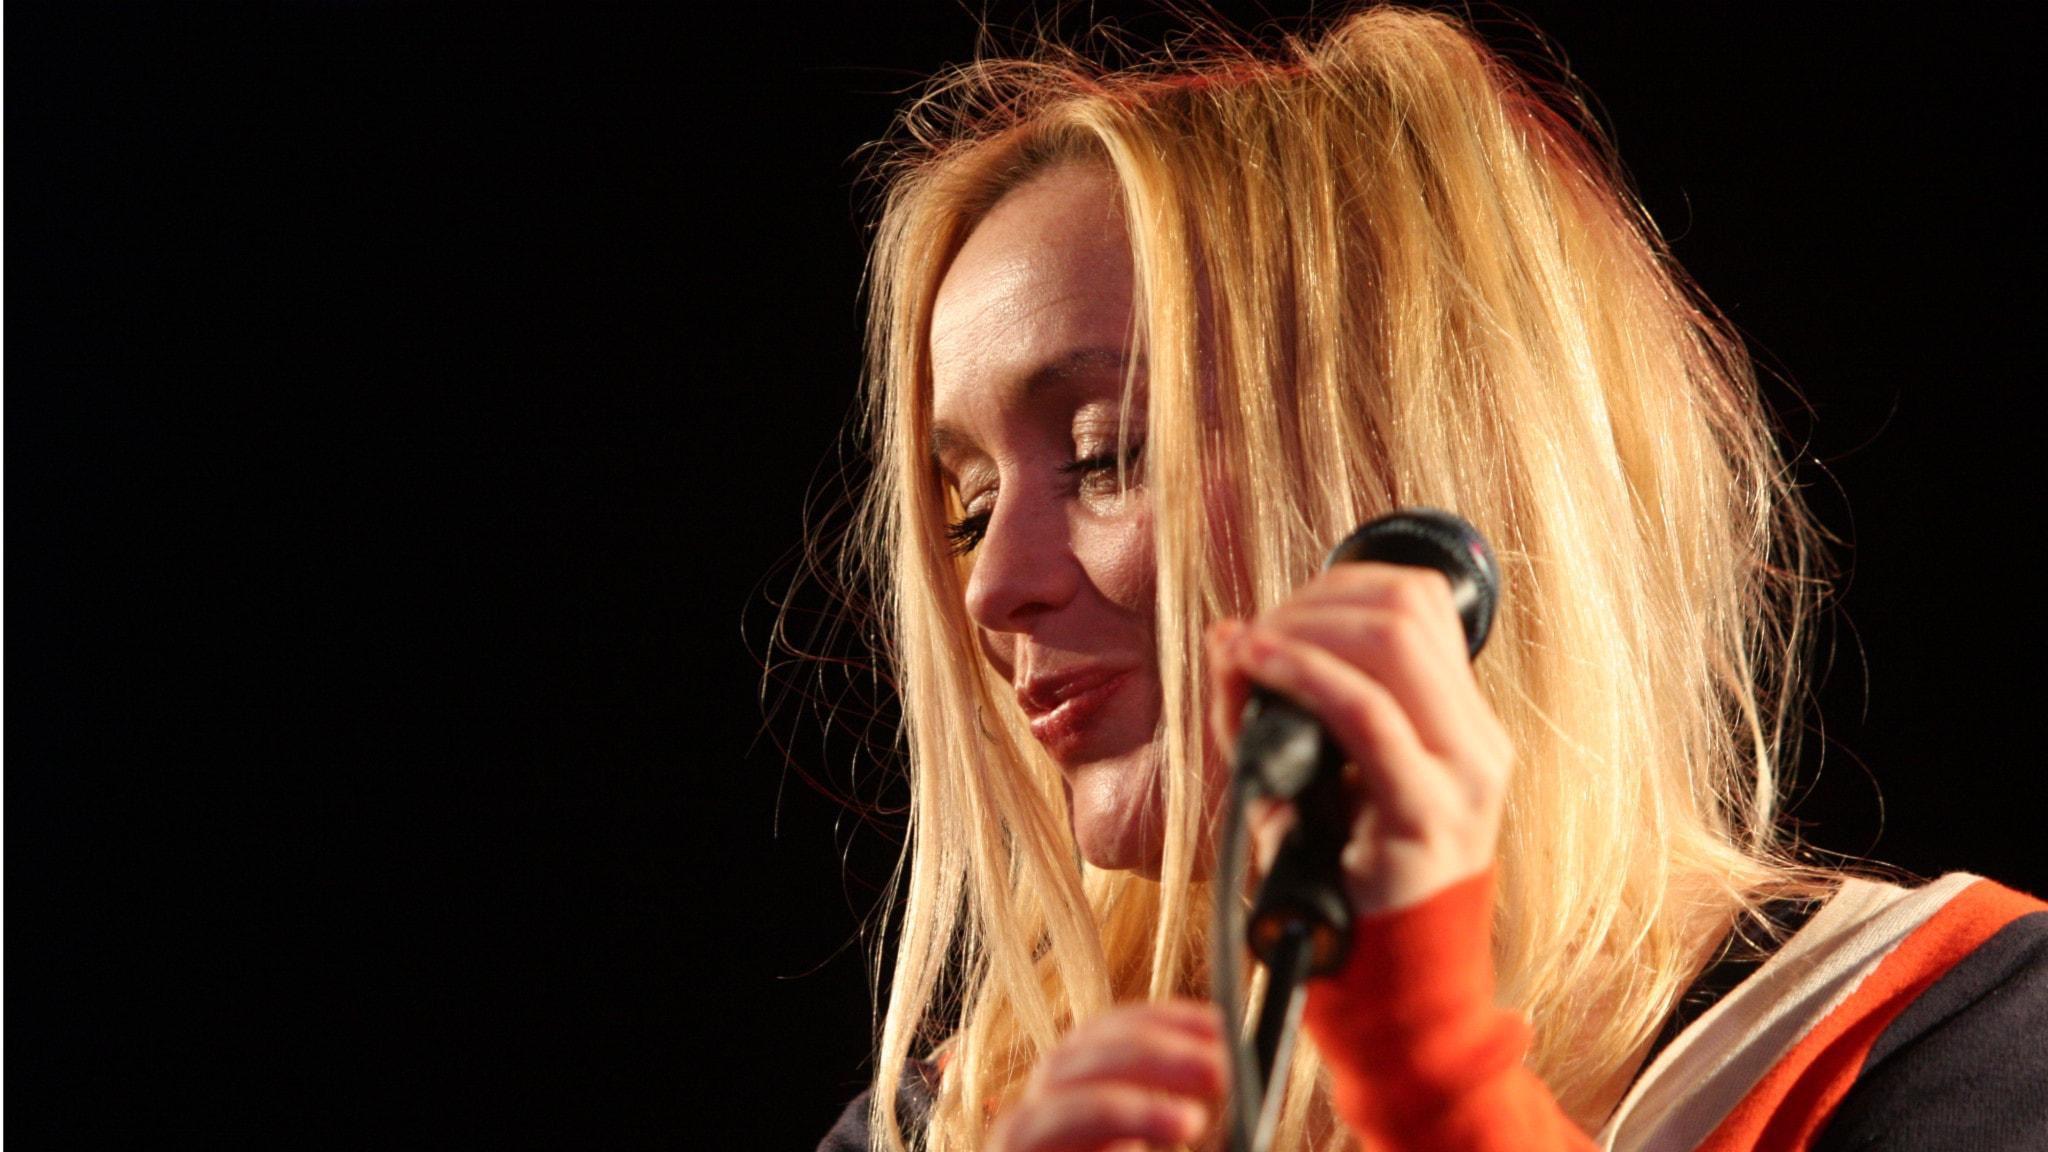 Lisa Ekdahl på Musikplats Stockholm. Foto: Lars-Åke Gustavsson/Sveriges Radio